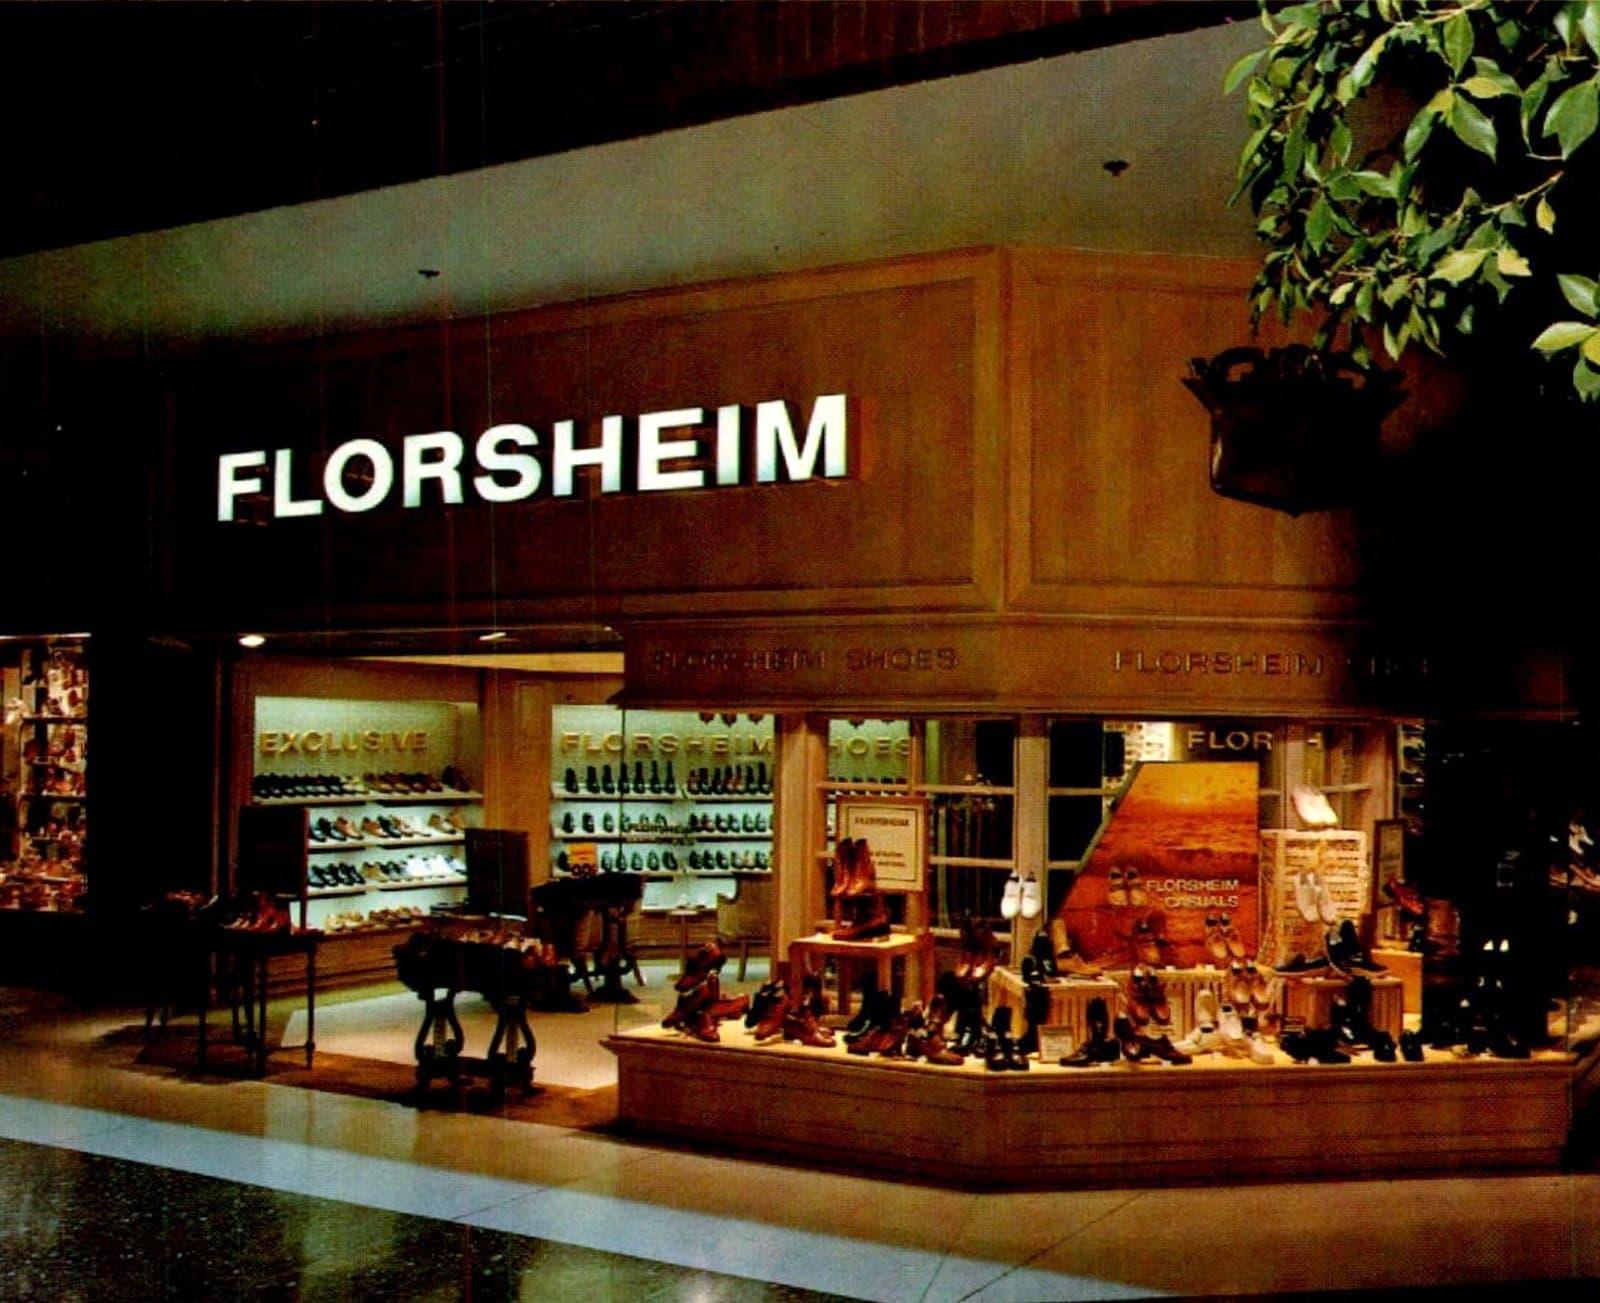 Retro 70s Florsheim shoe store at a mall (1978)